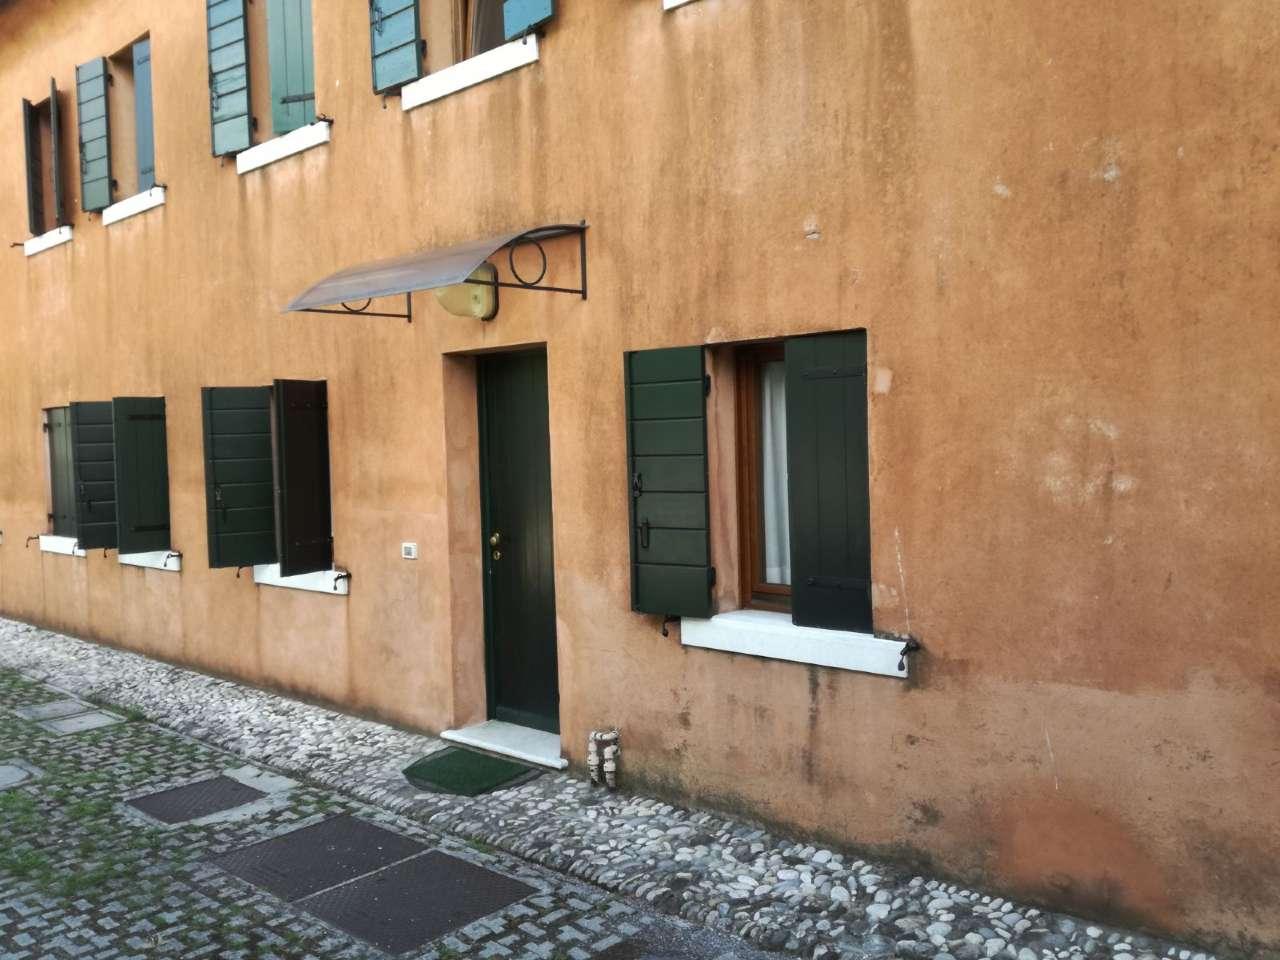 Appartamento in Zona S. Giuseppe ( TV) 90,00 mq  in Villa Veneta ingresso indipendente  850,00 €